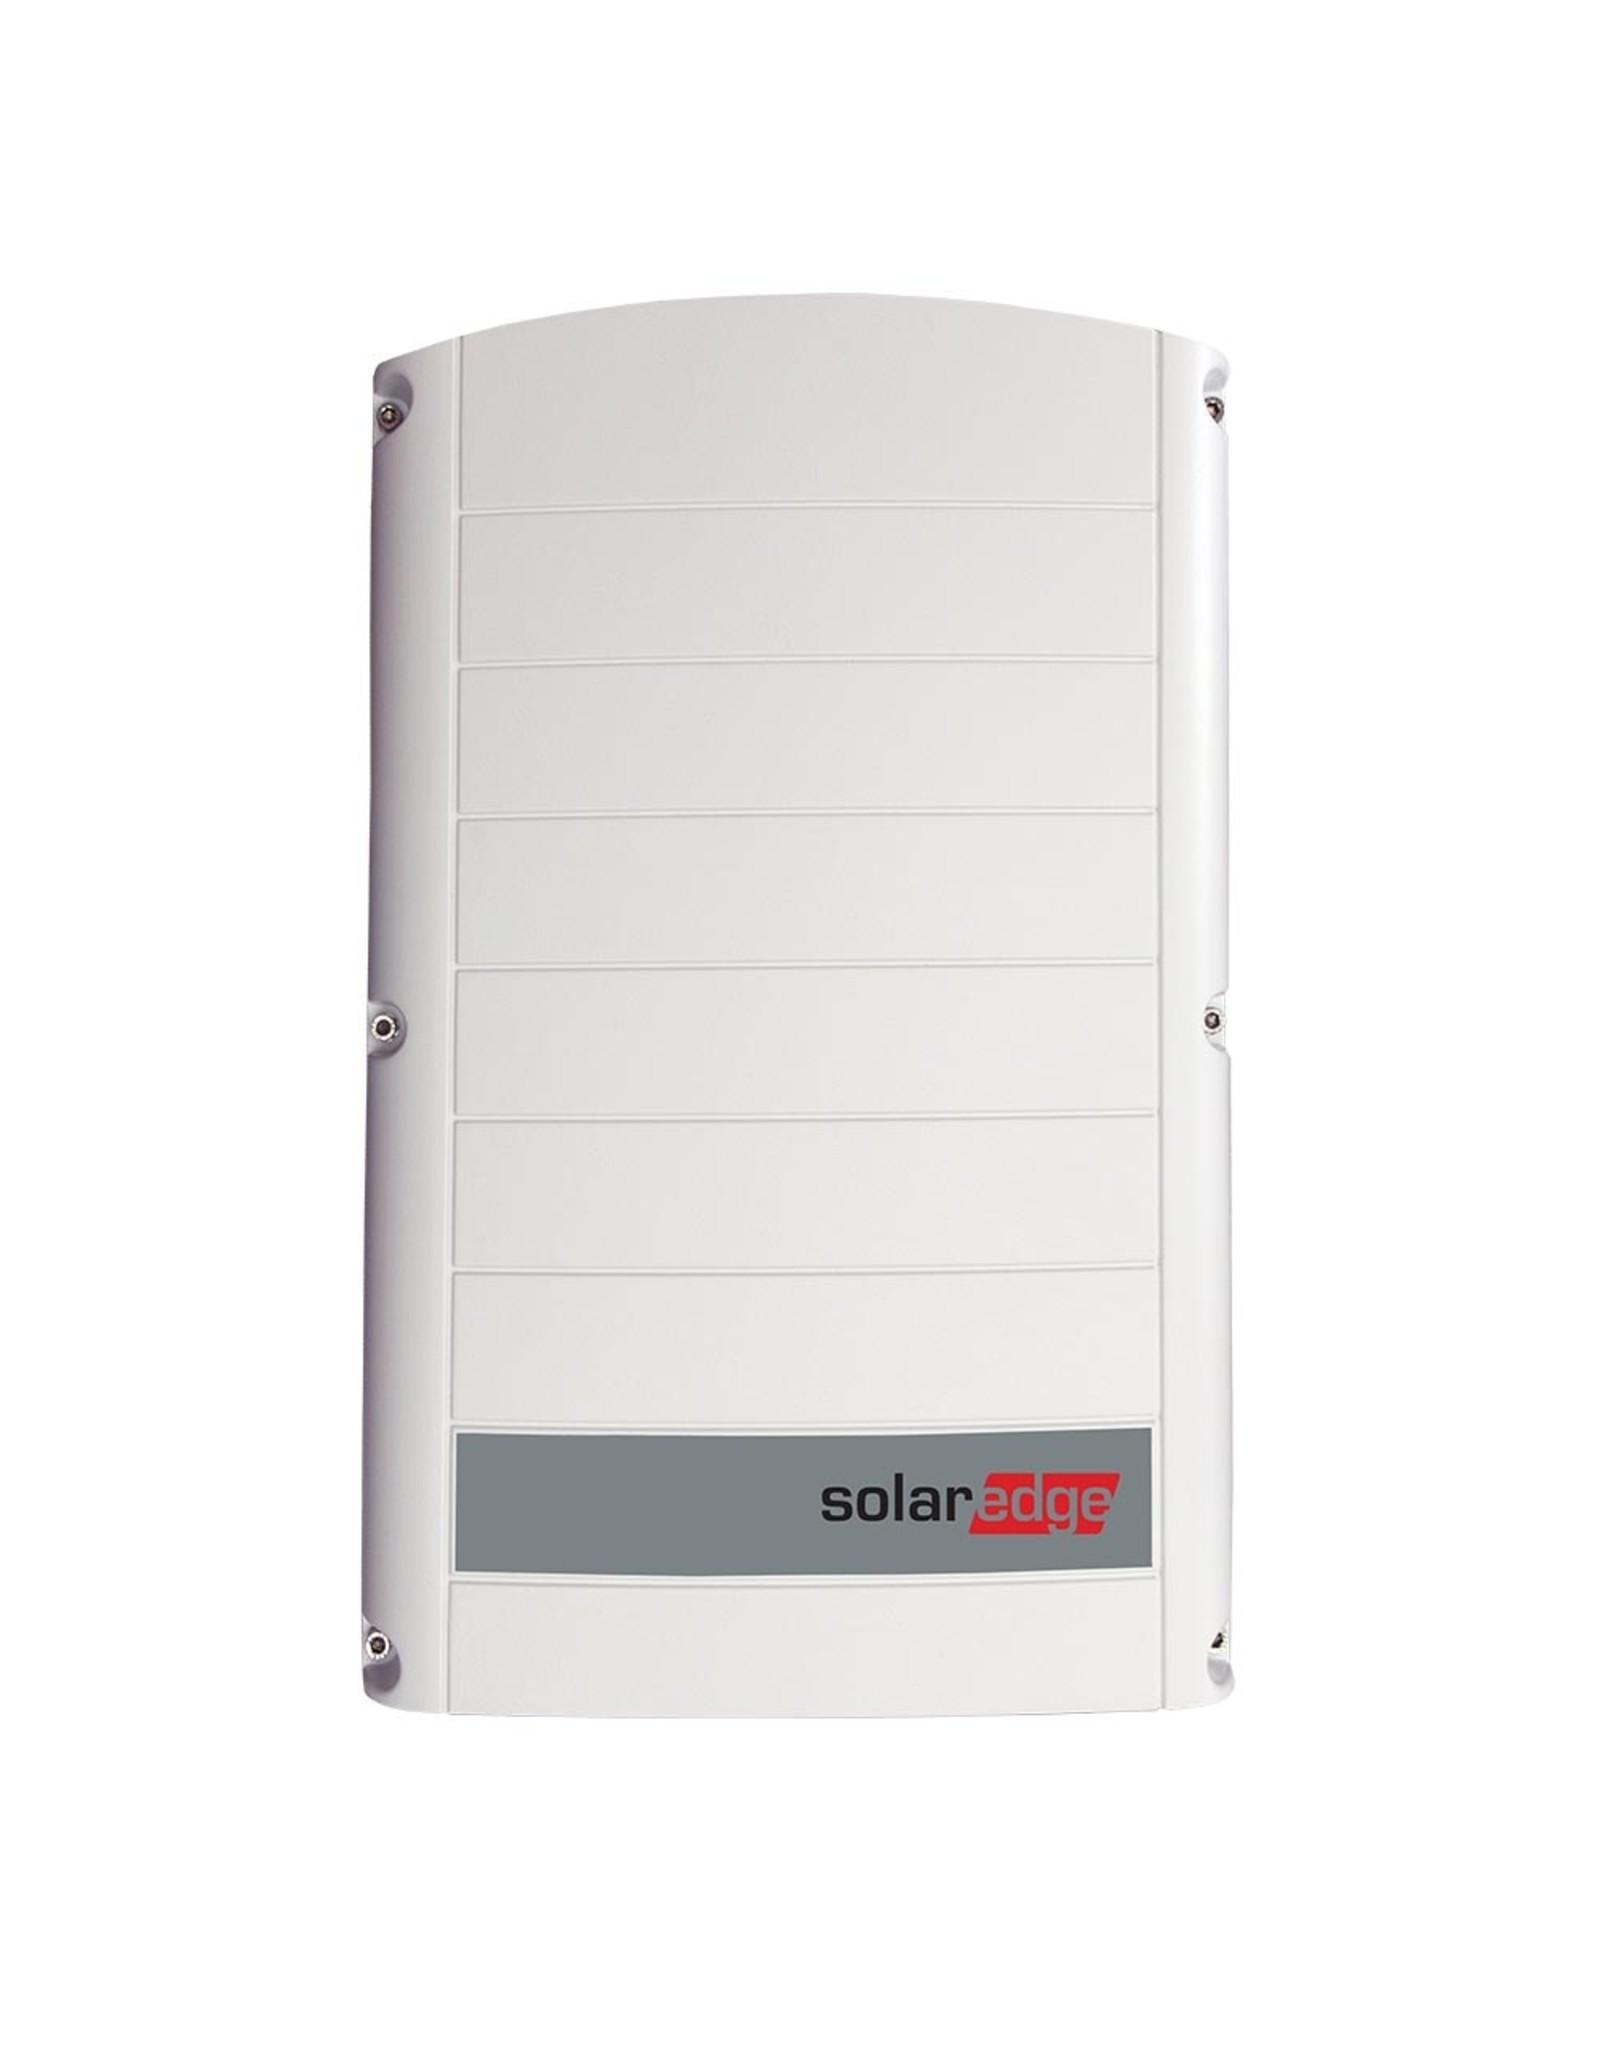 SolarEdge SolarEdge SE4K driefase omvormer 4.0 kW - met SetApp configuratie